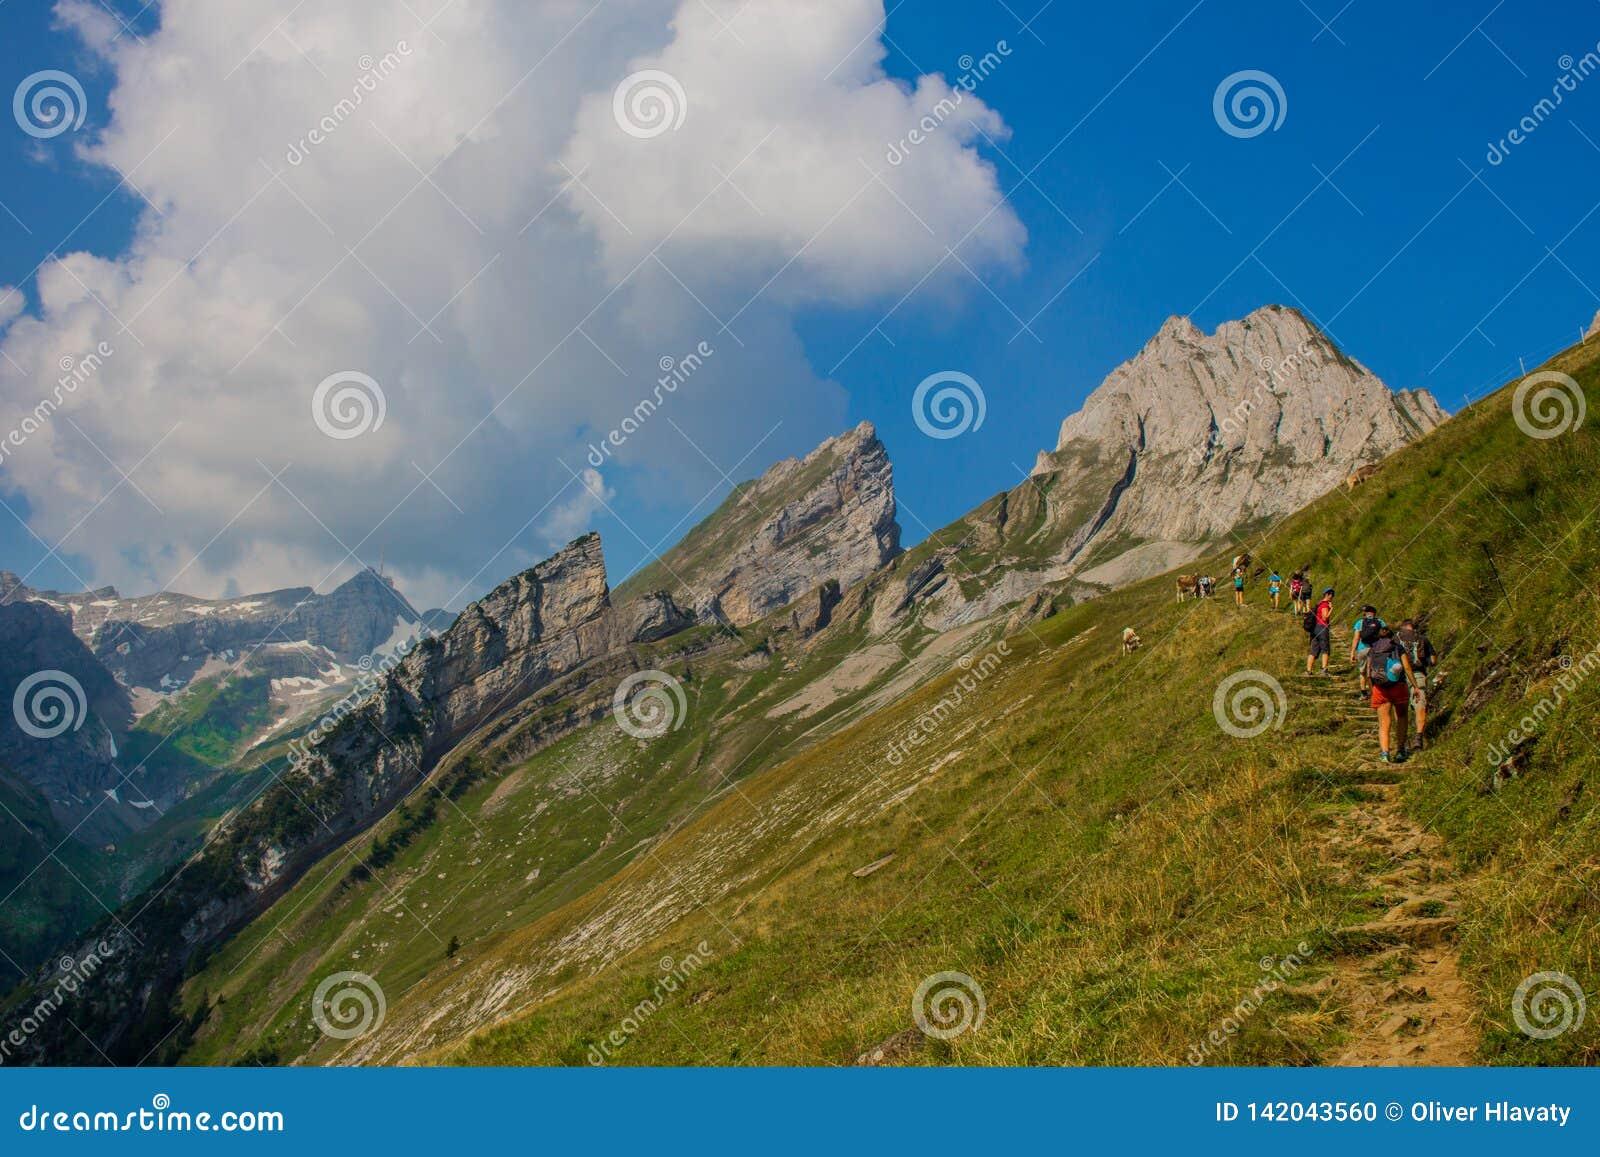 Exploratory tour through the beautiful Appenzell mountain region